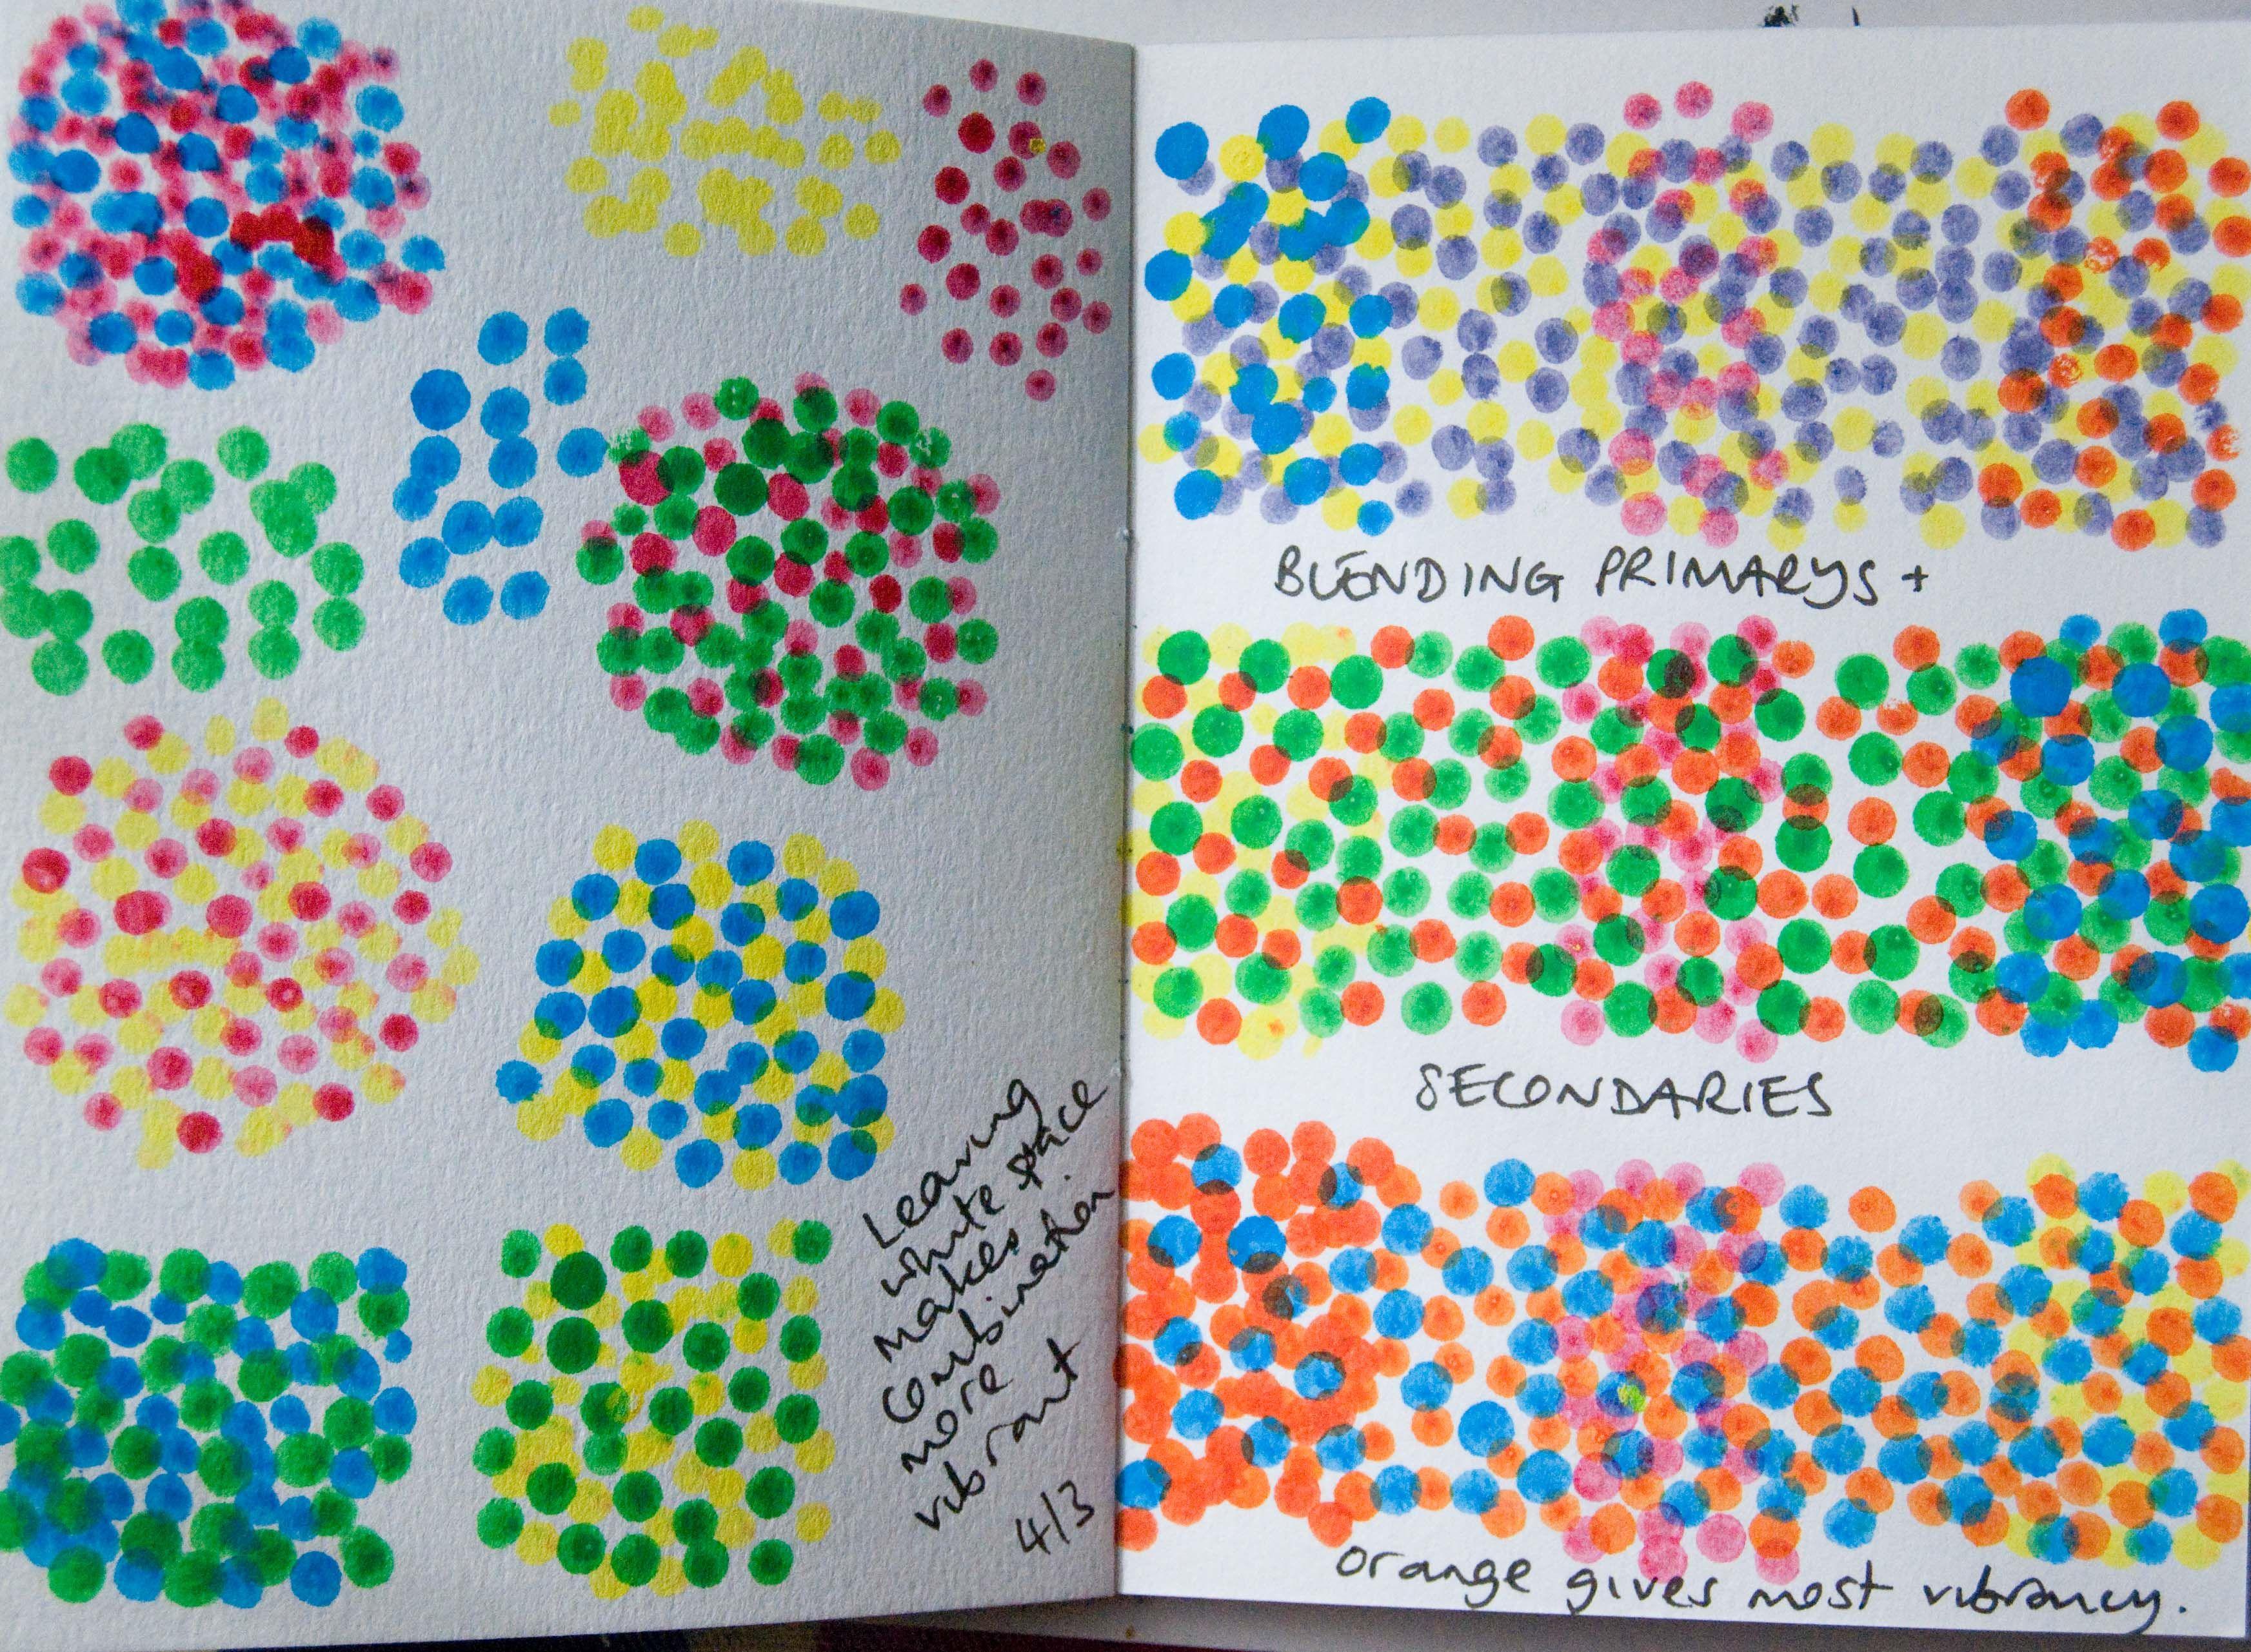 easy pointillism ideas - Google Search | Everything ART | Pinterest ...